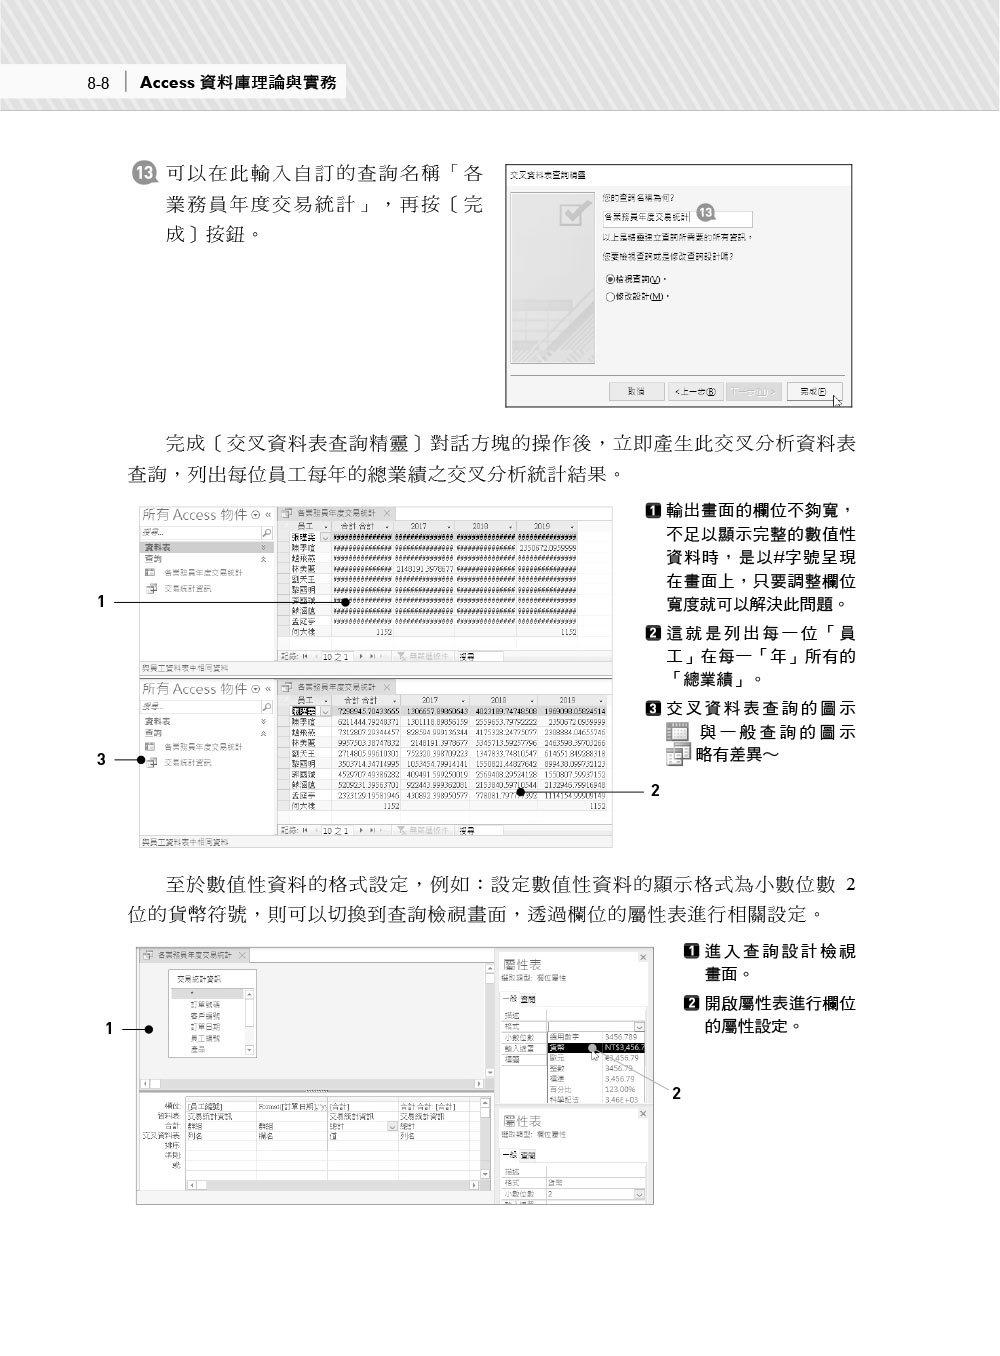 Access 2019 資料庫系統概論與實務 -- 適用 2019/2016-preview-8